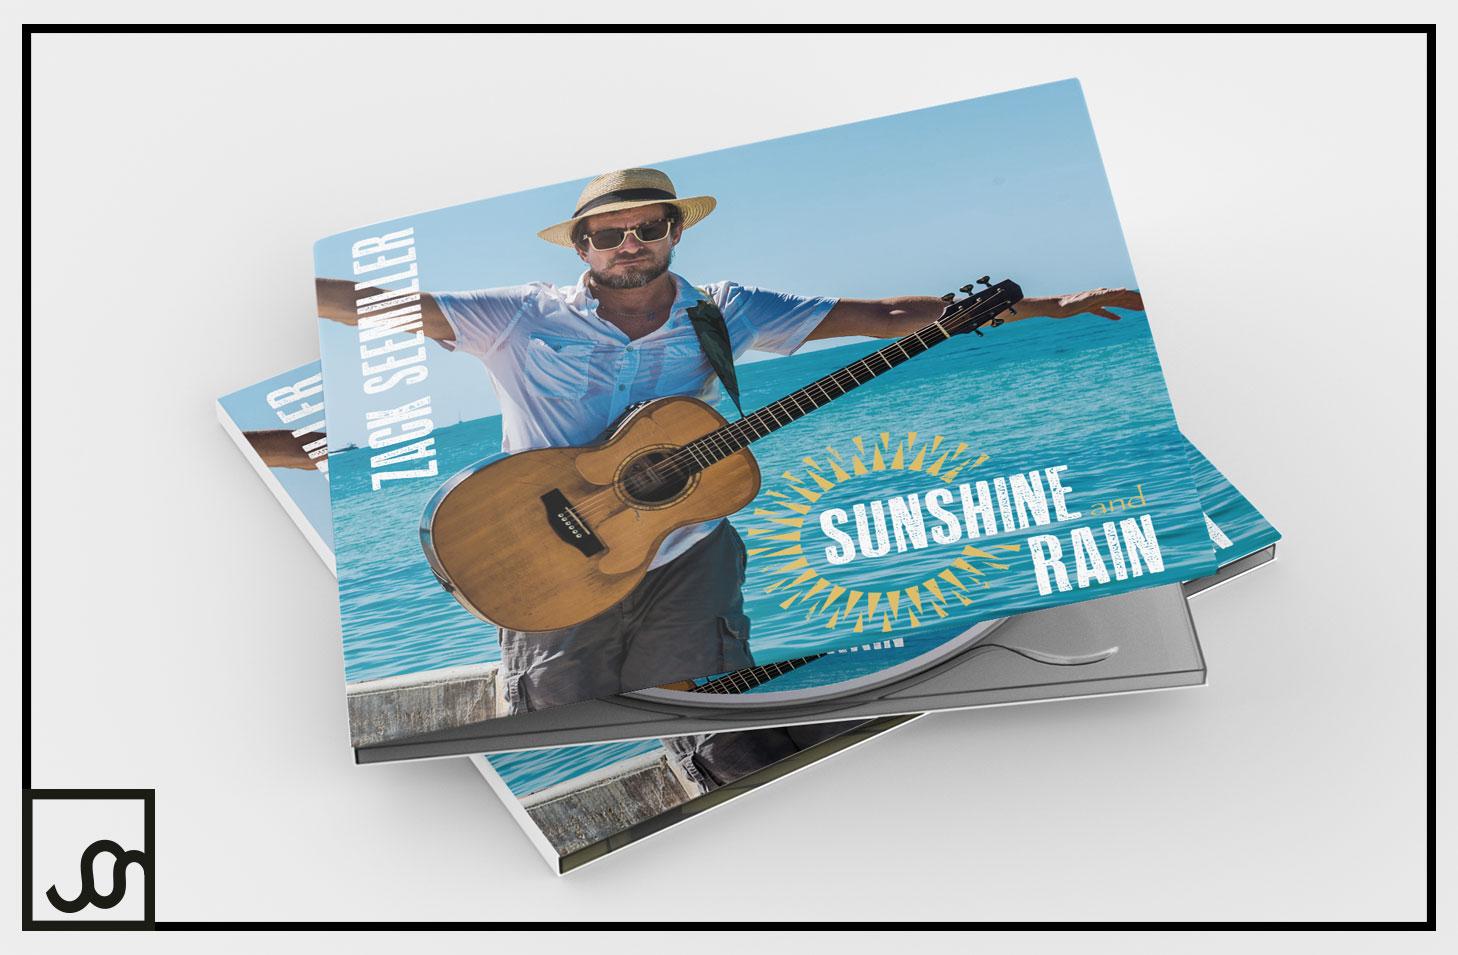 Zack Seemiller Sunshine and Rain CD Cover